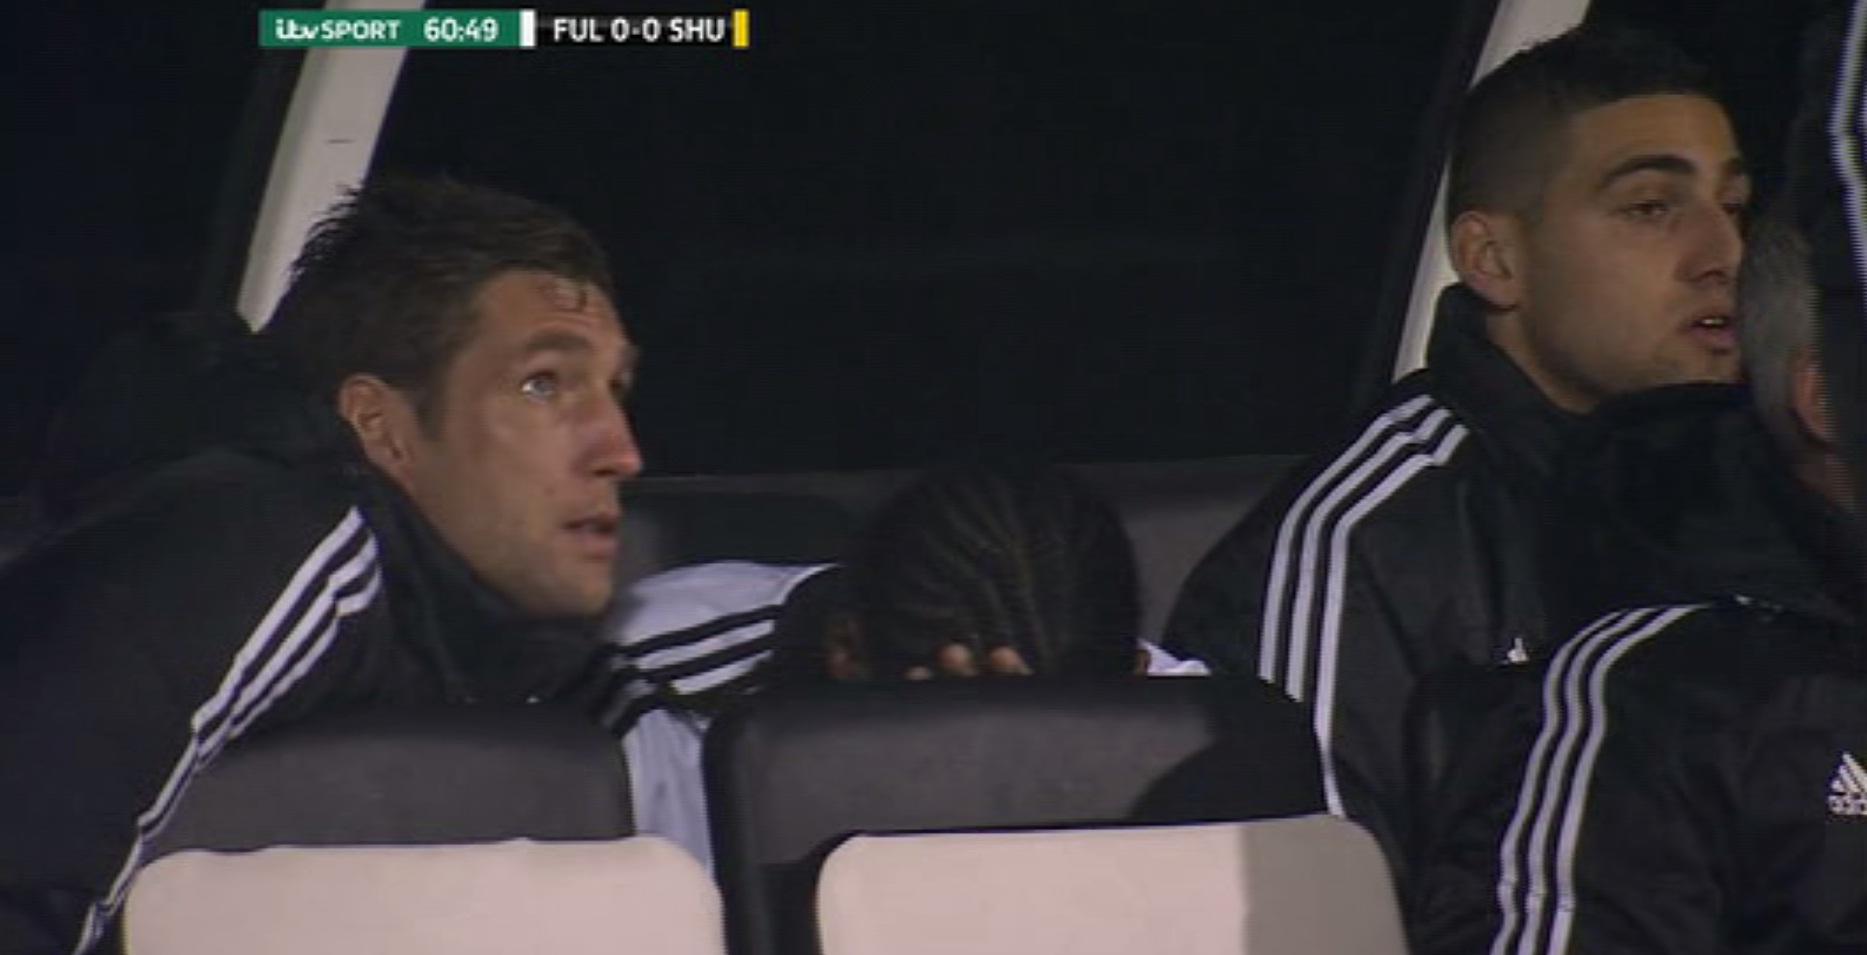 Fulham's Hugo Rodallega distraught at Sheffield United subbing